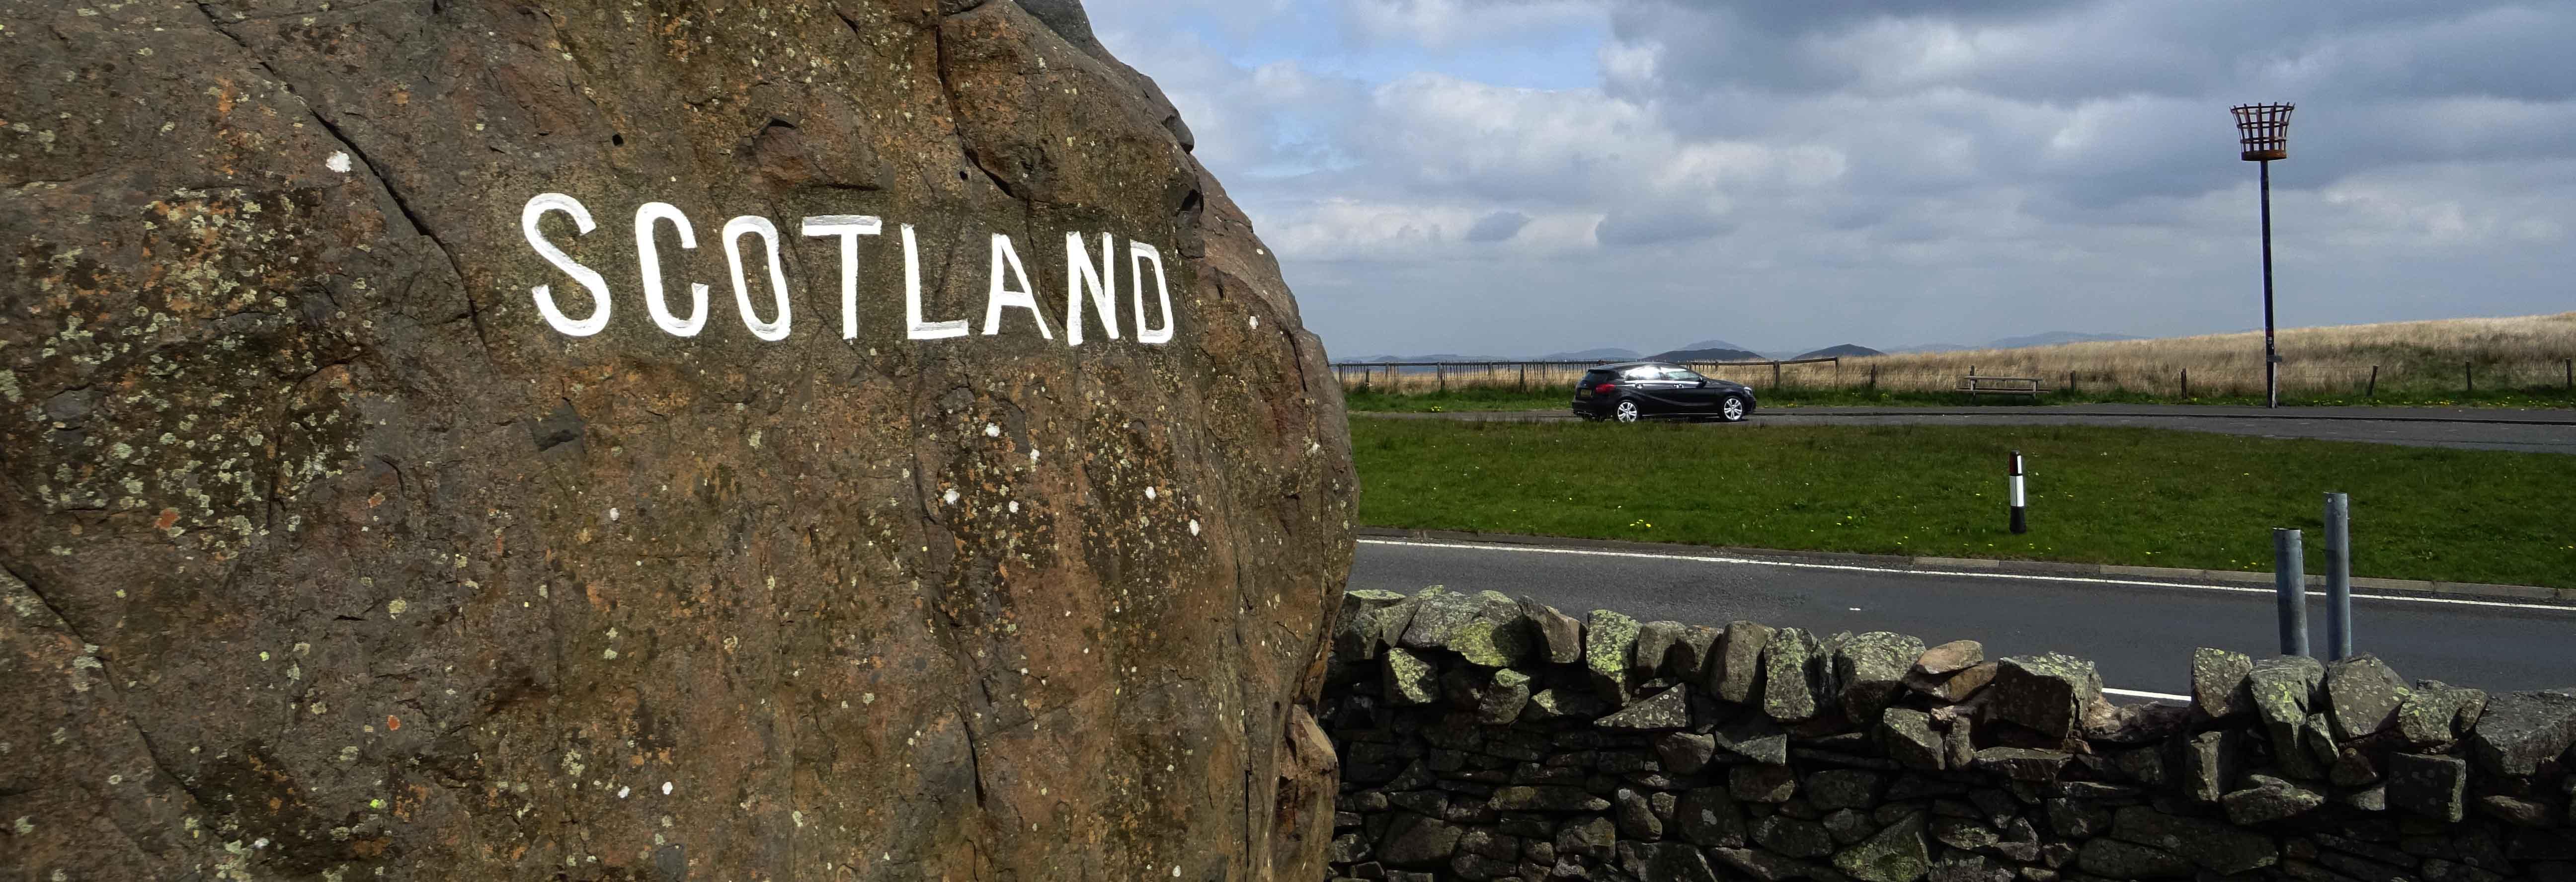 Schotland!